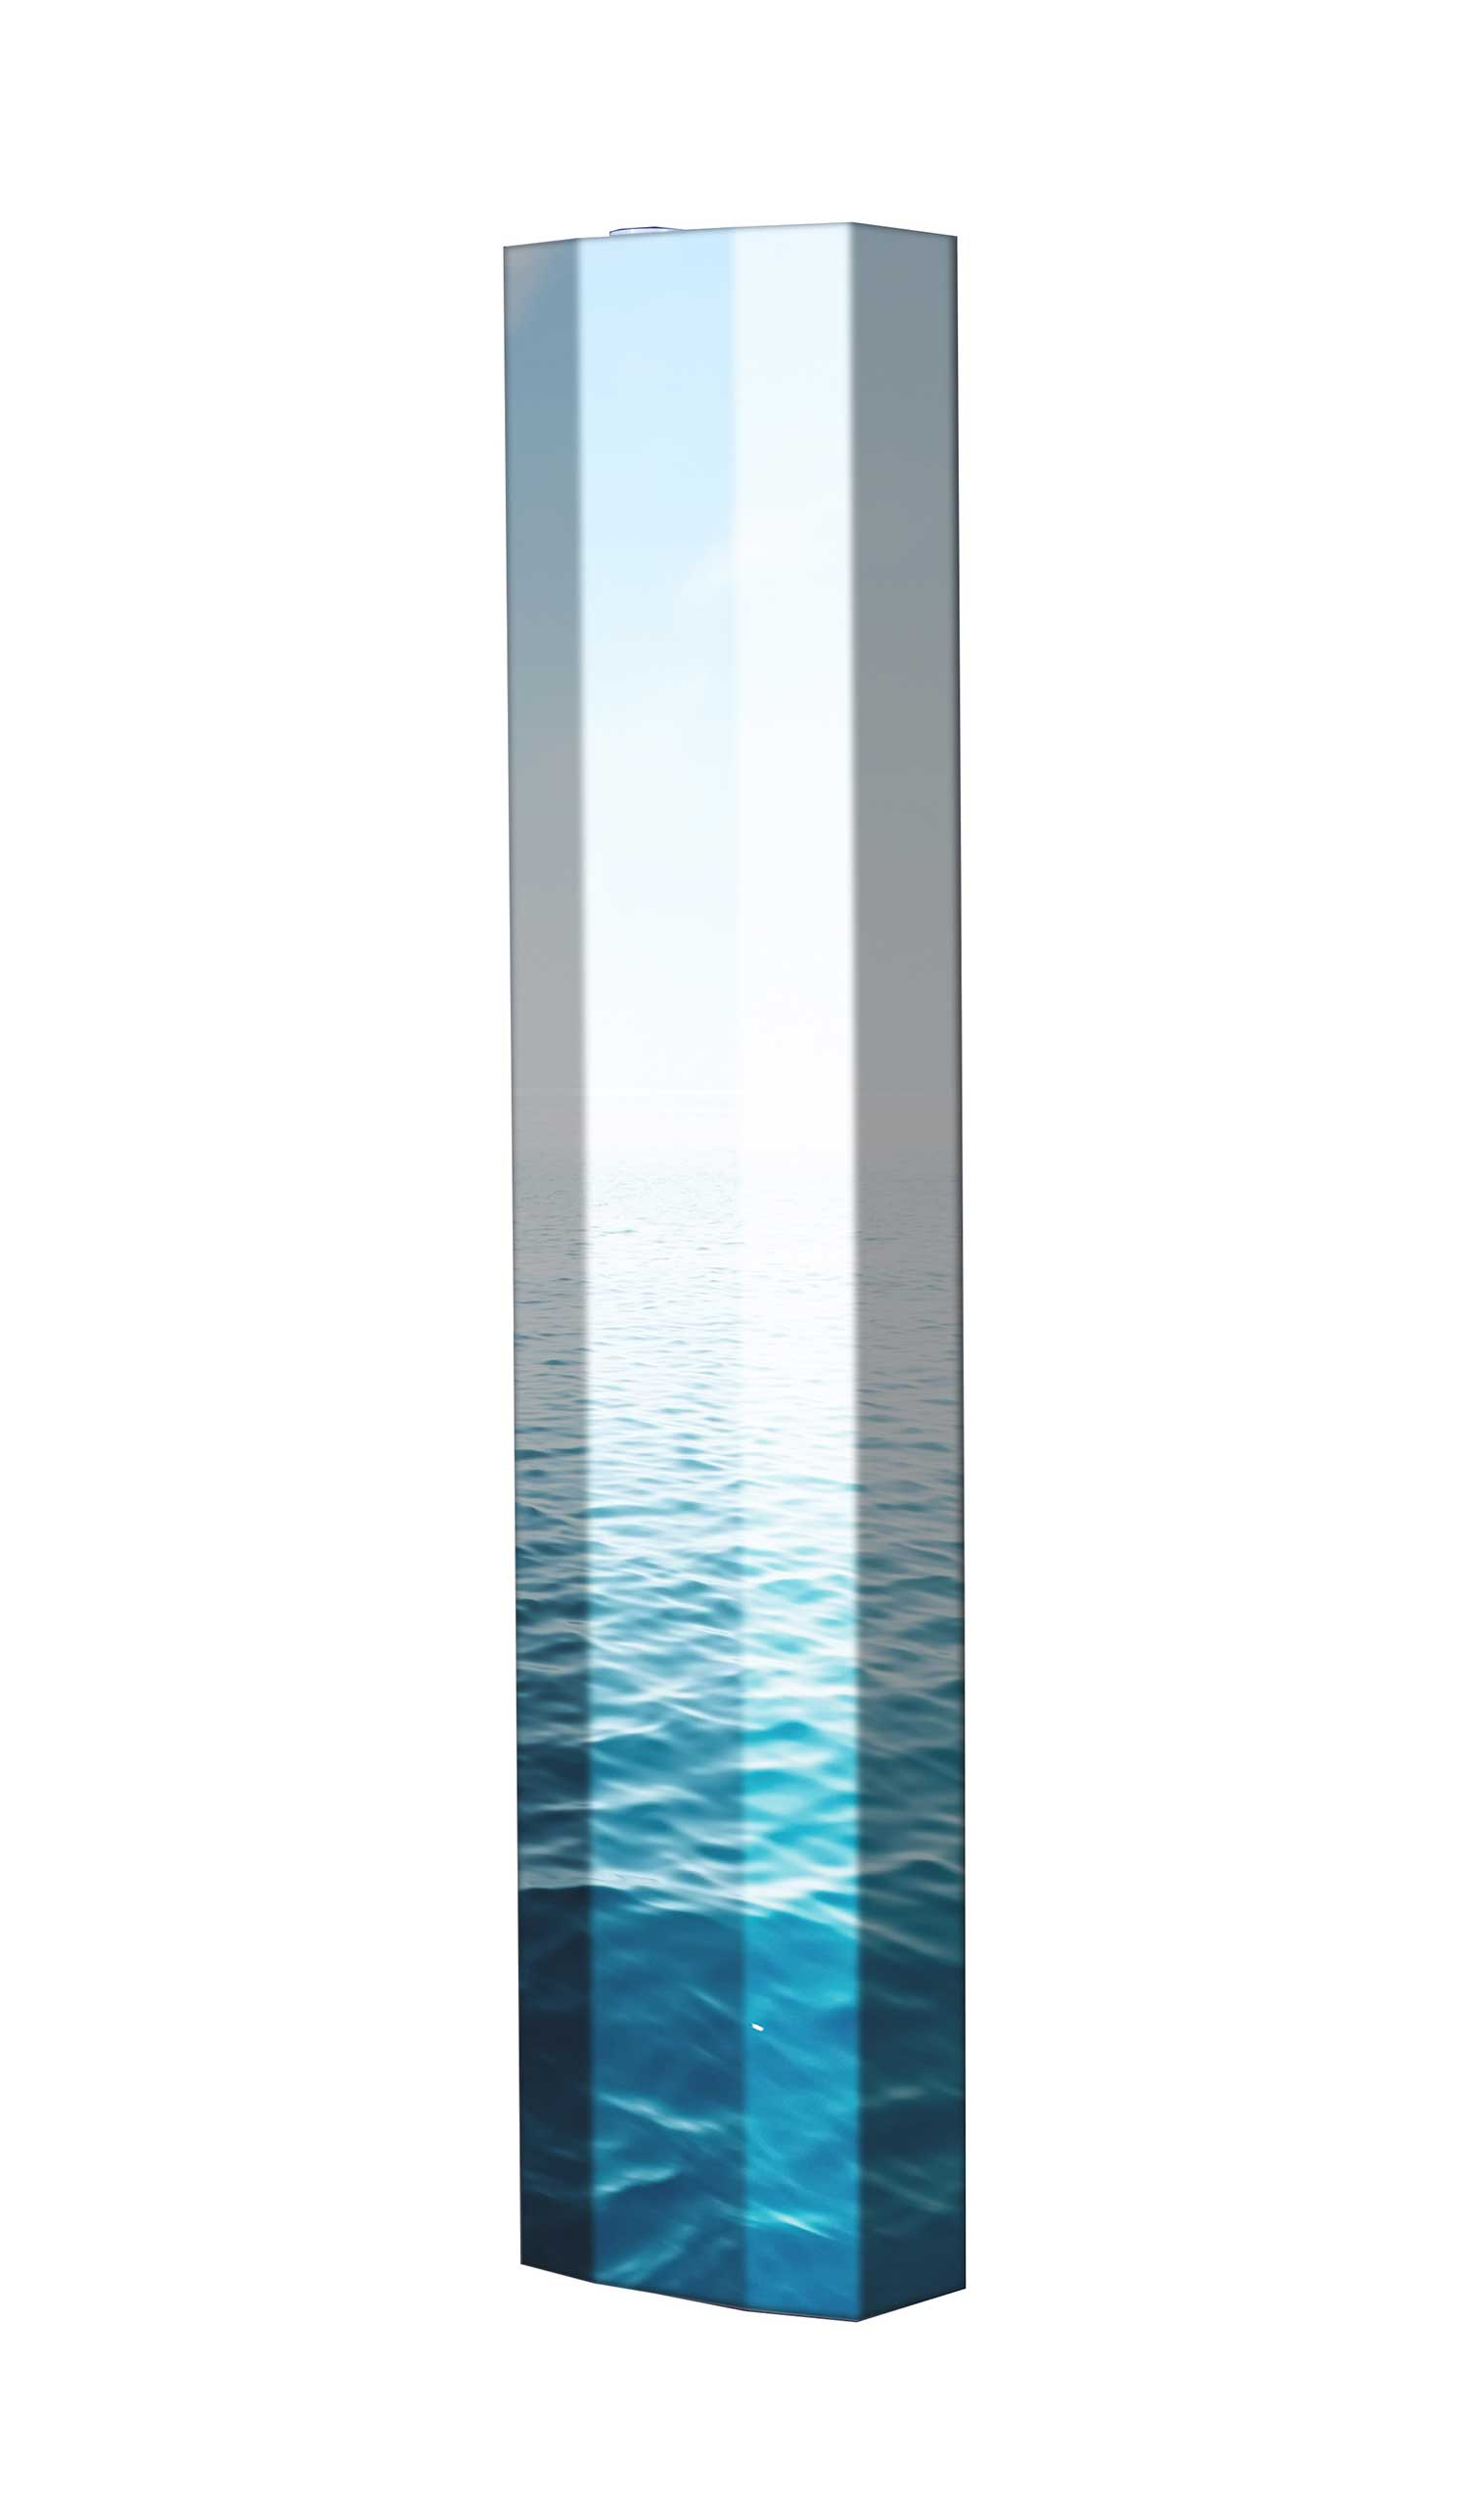 Schuhschrank STORM Motivschrank Single S136 Meer Wasser weiß